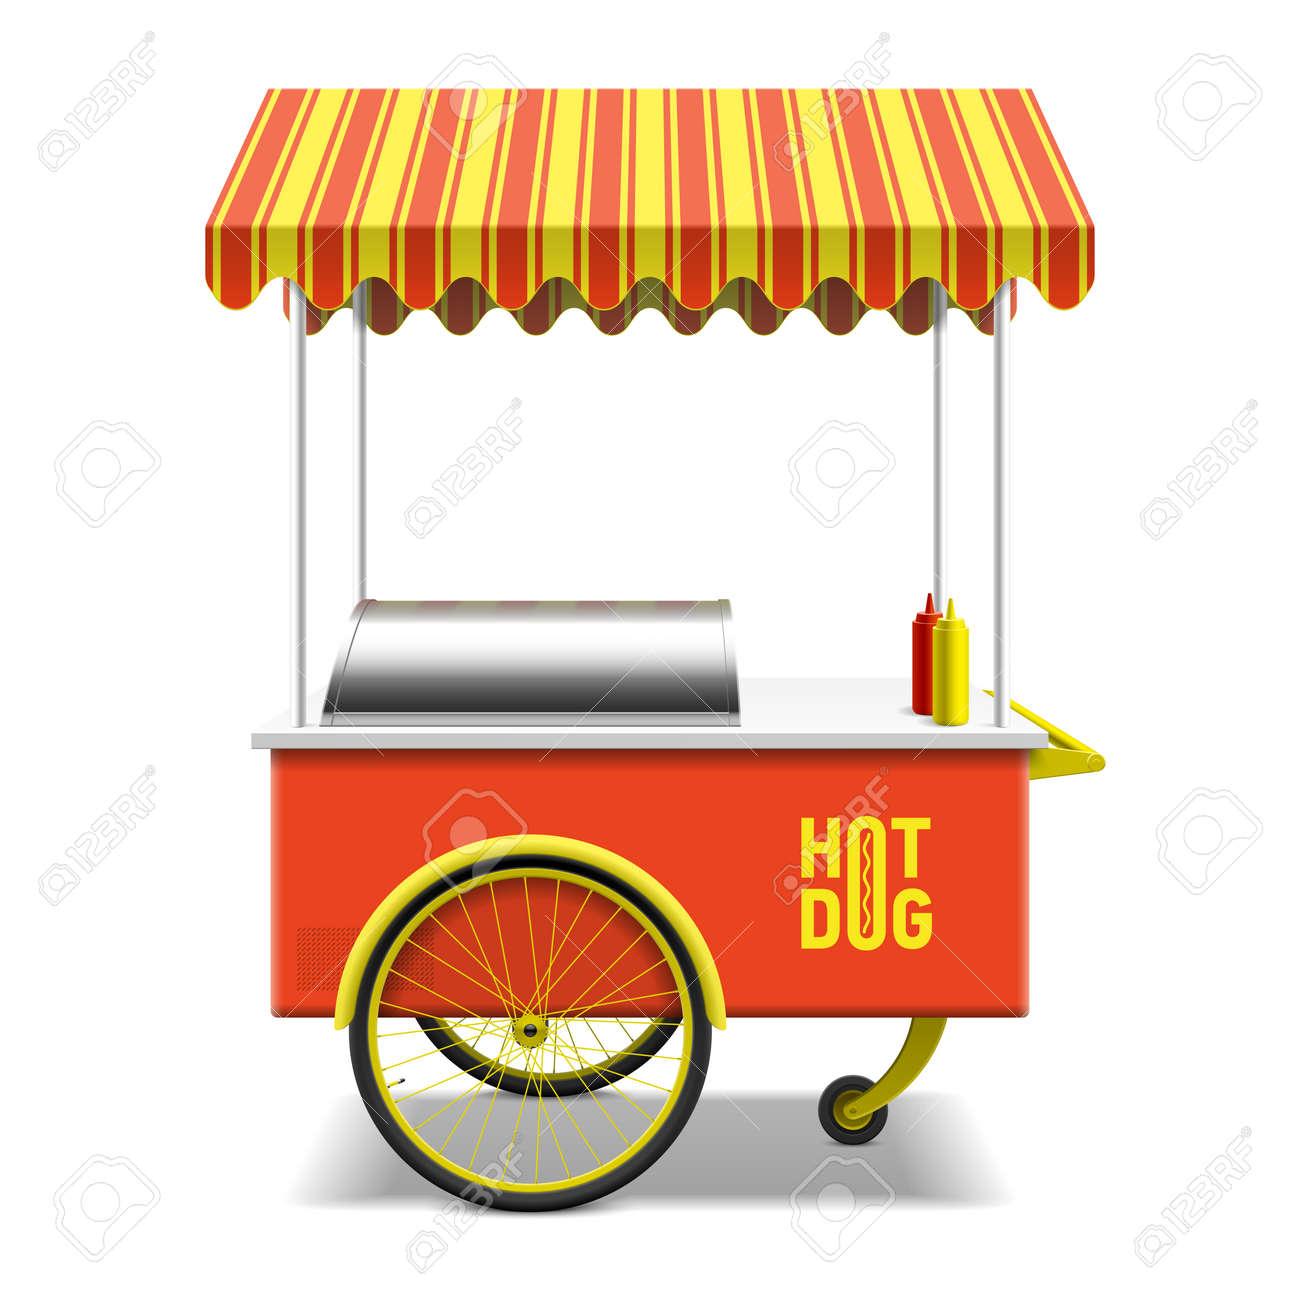 797 hot dog cart stock illustrations cliparts and royalty free hot rh 123rf com  clip art cartoon hot dogs